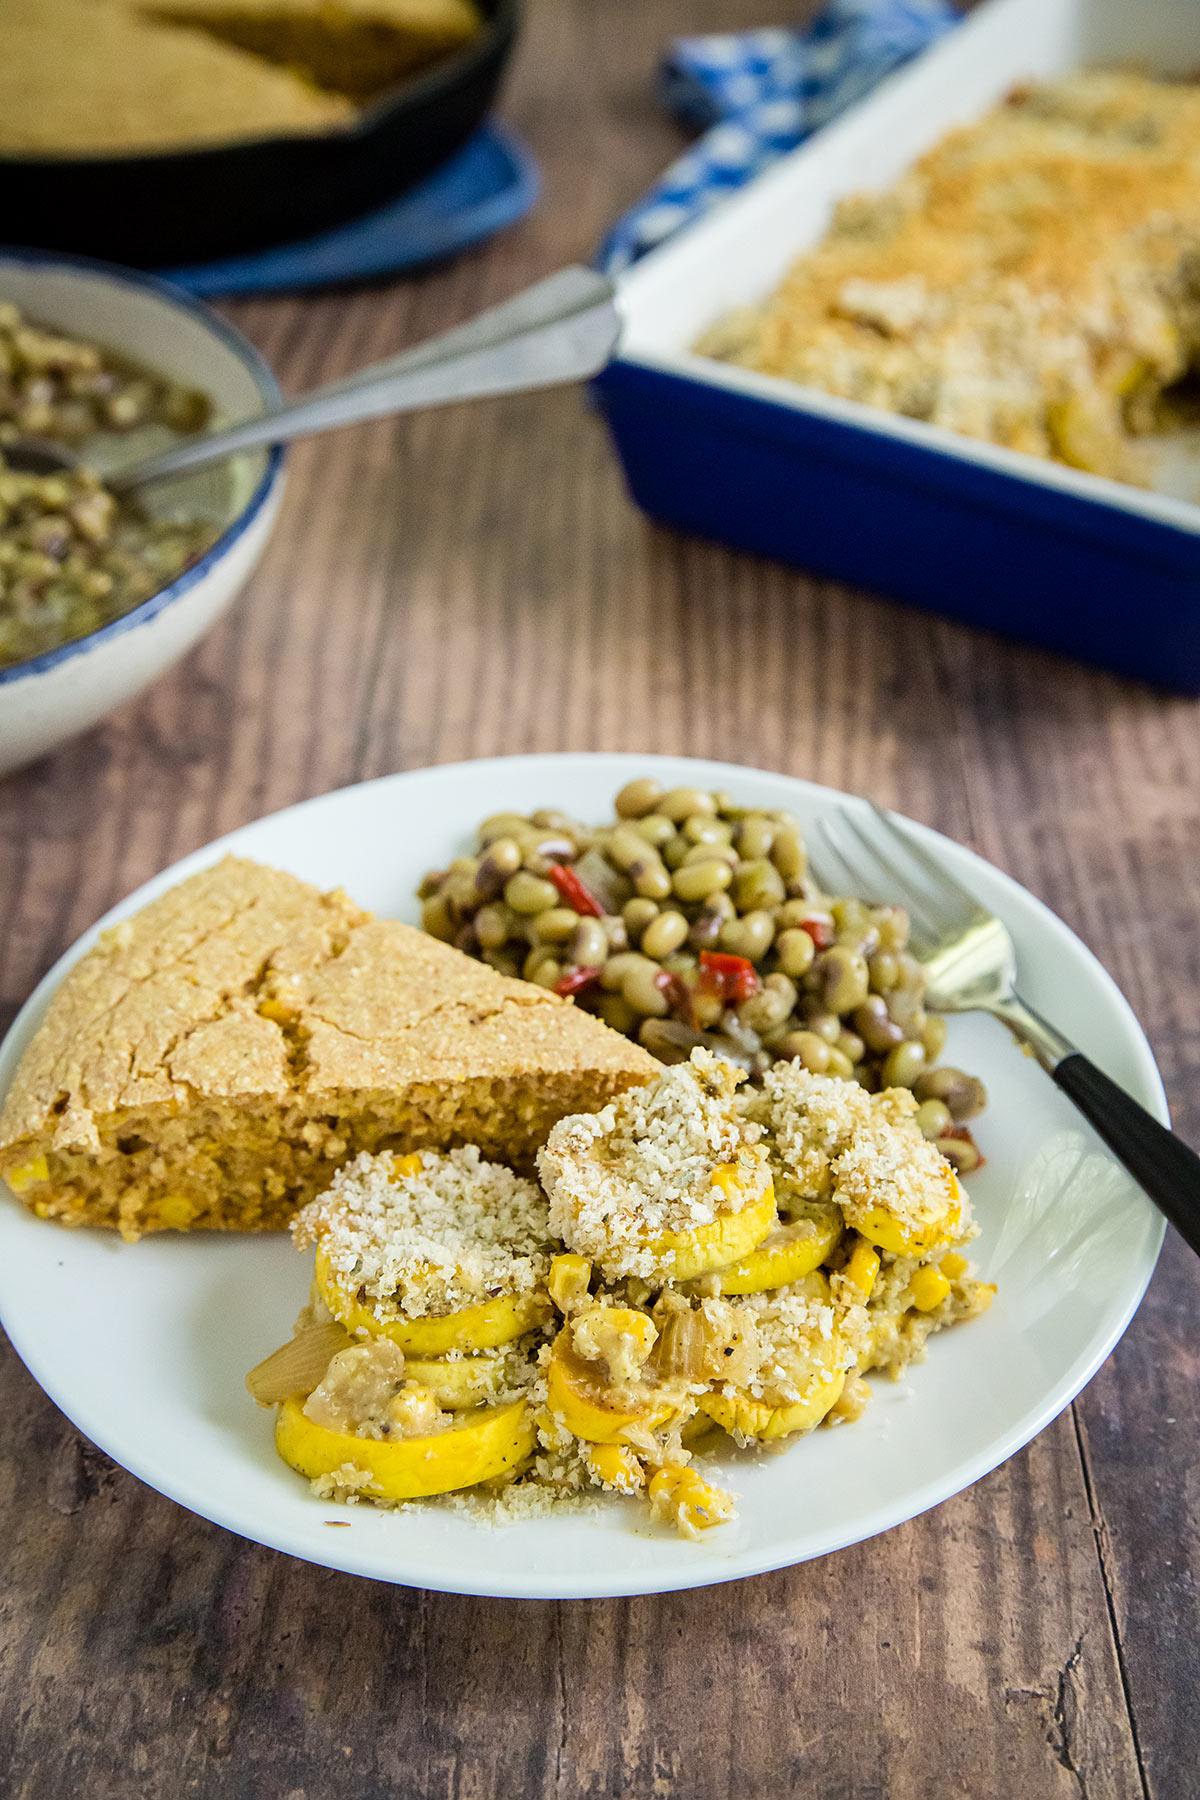 Squash and Corn Casserole with vegan cornbread and field peas